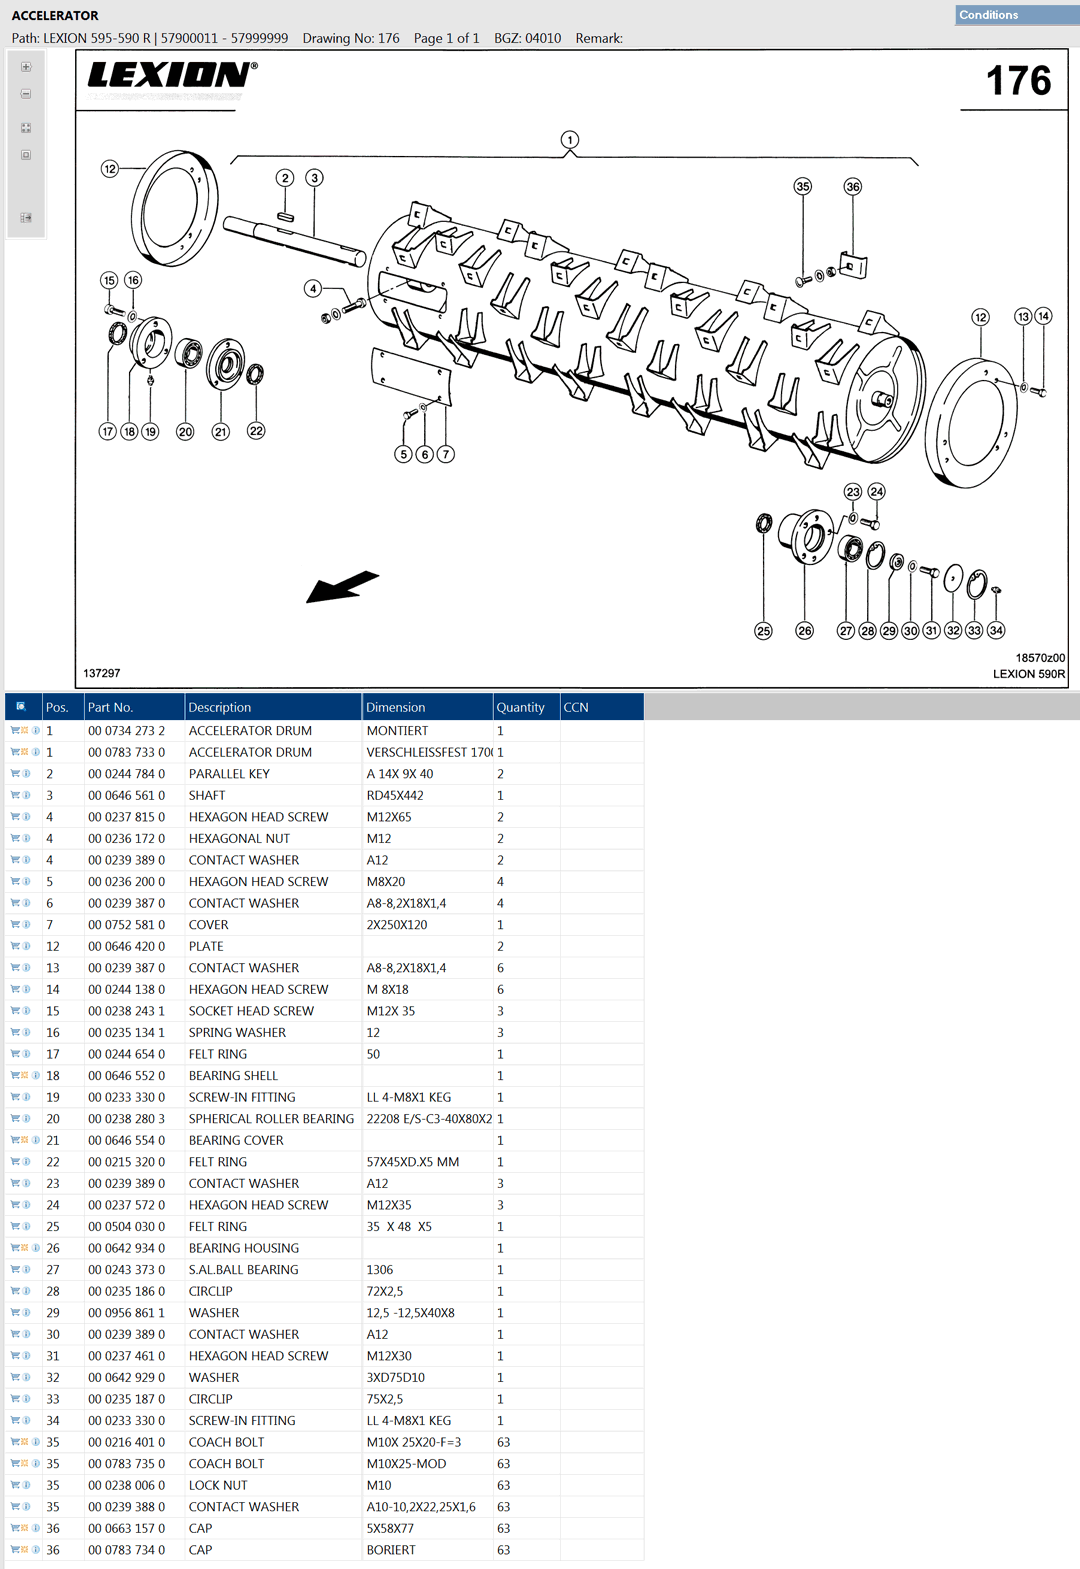 Lexion 470R parts and scheme - accelarator